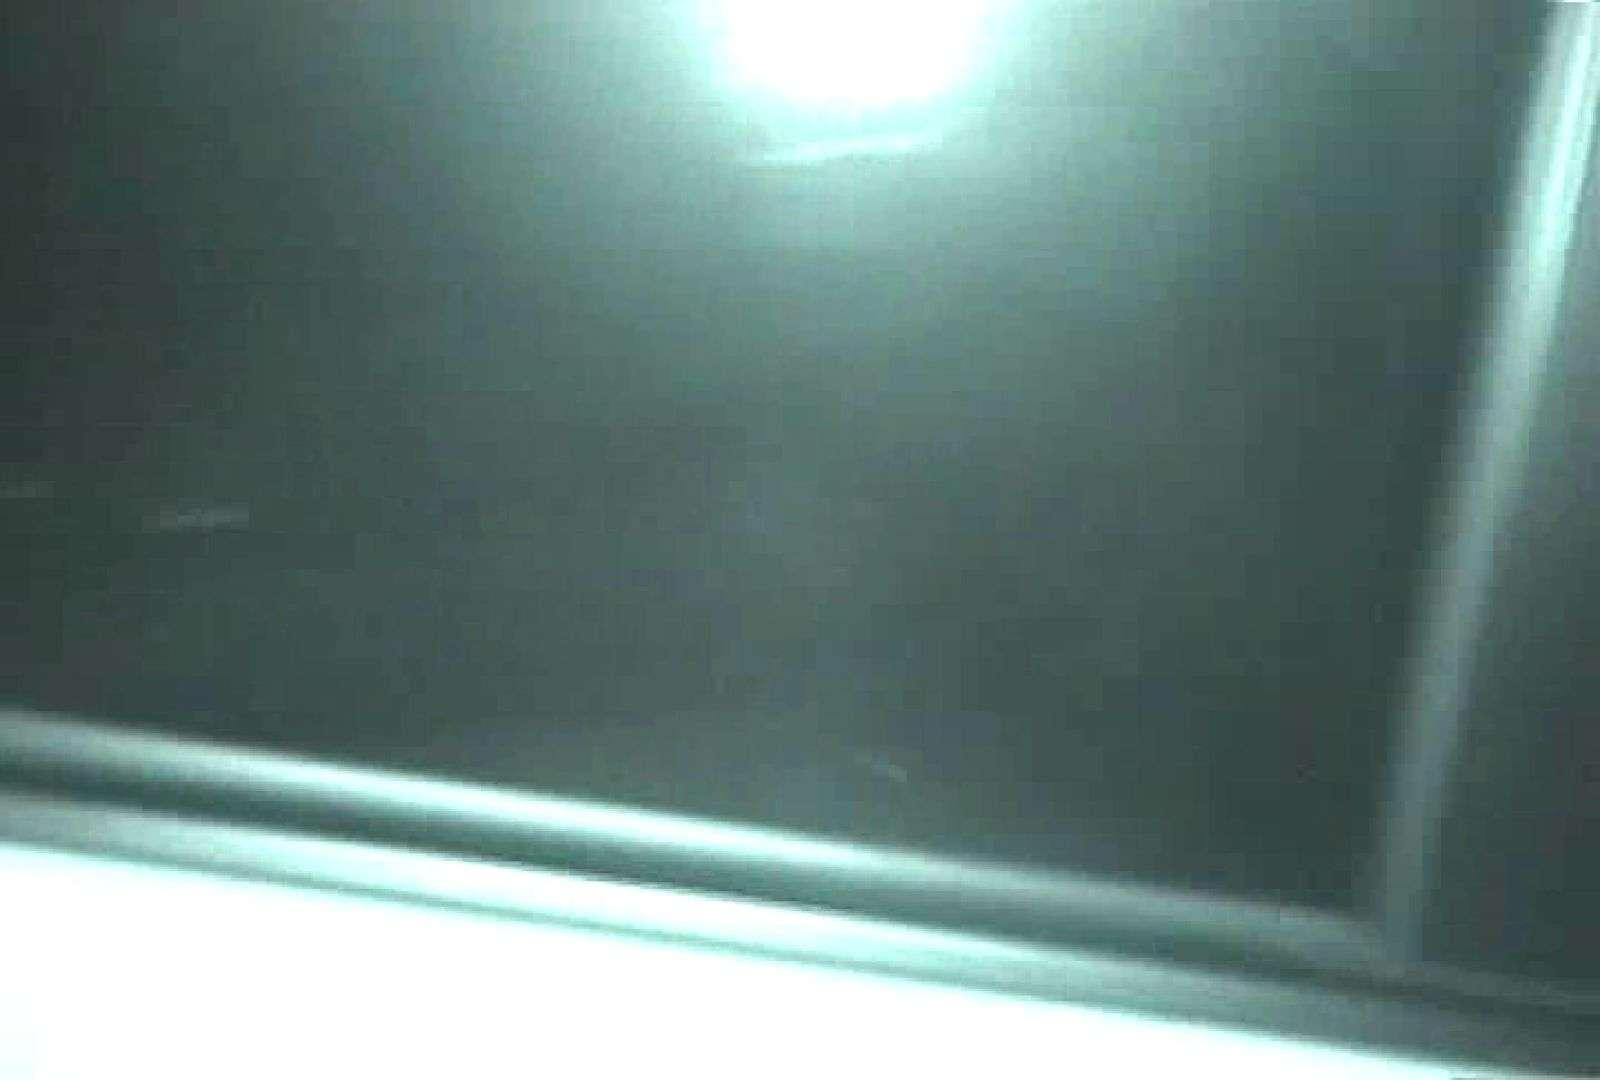 充血監督の深夜の運動会Vol.42 女子風呂盗撮 オメコ無修正動画無料 55画像 23